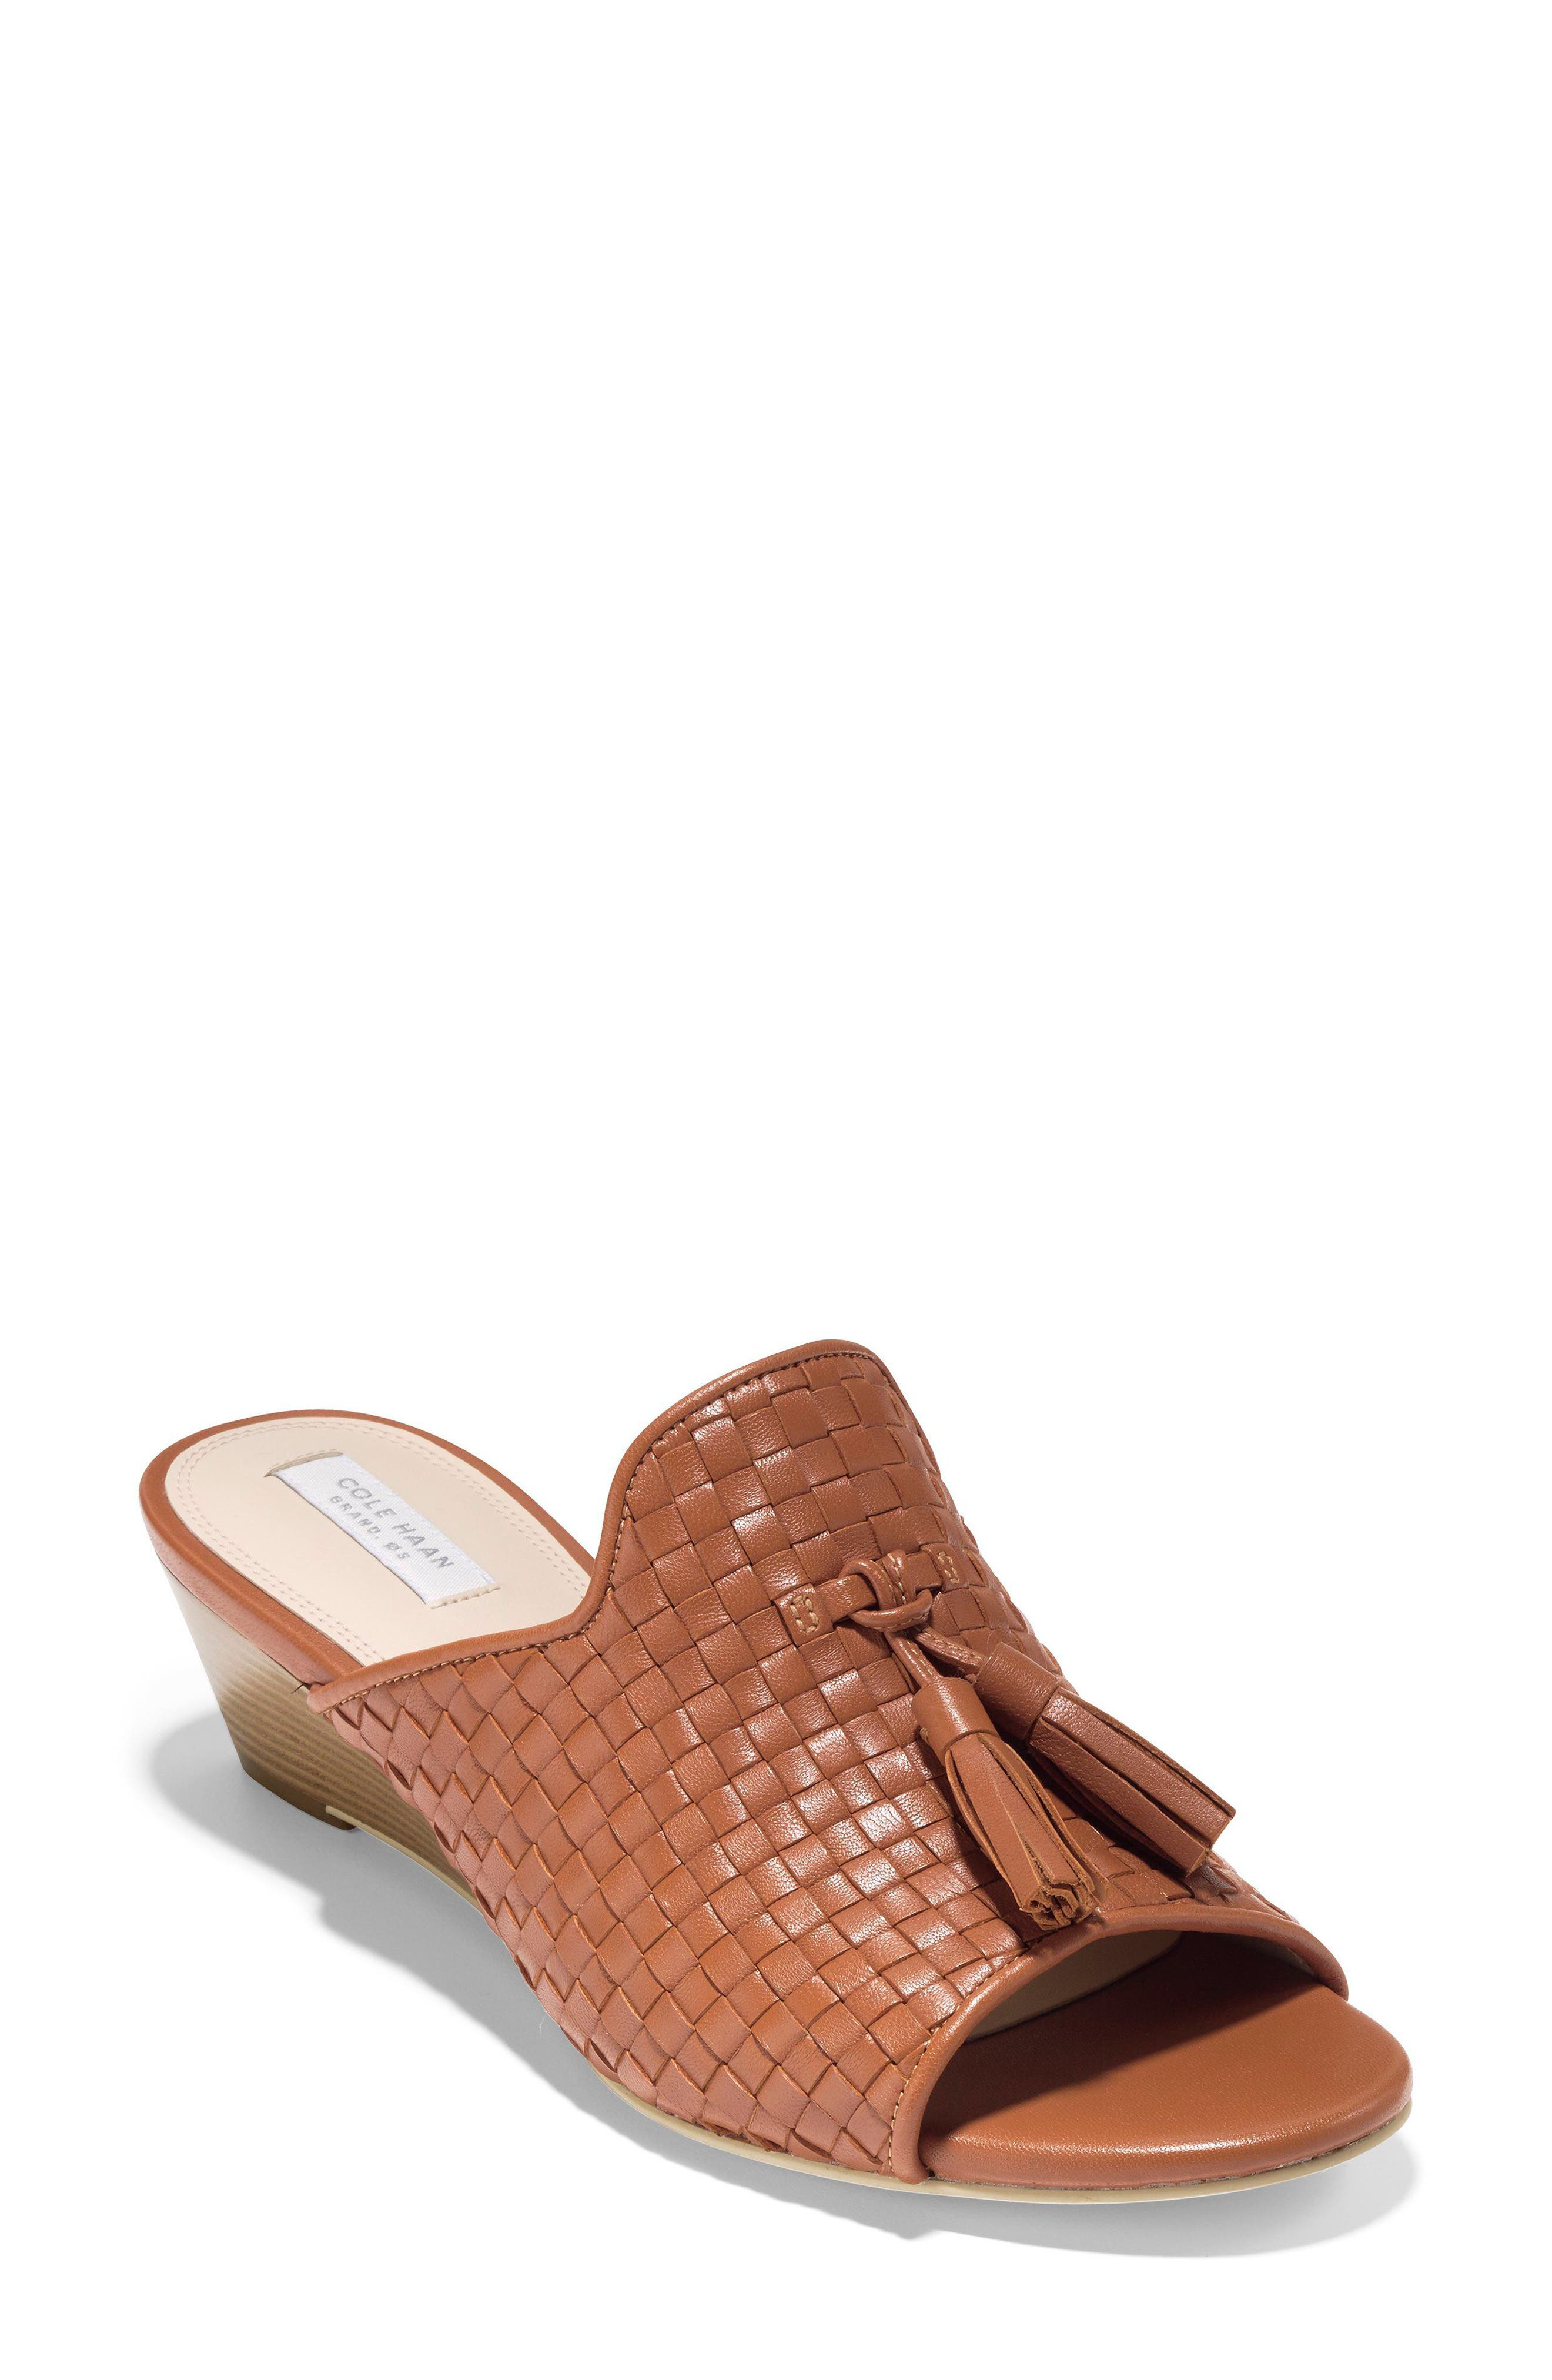 Jagger Wedge Sandal,                             Main thumbnail 1, color,                             Acorn Leather